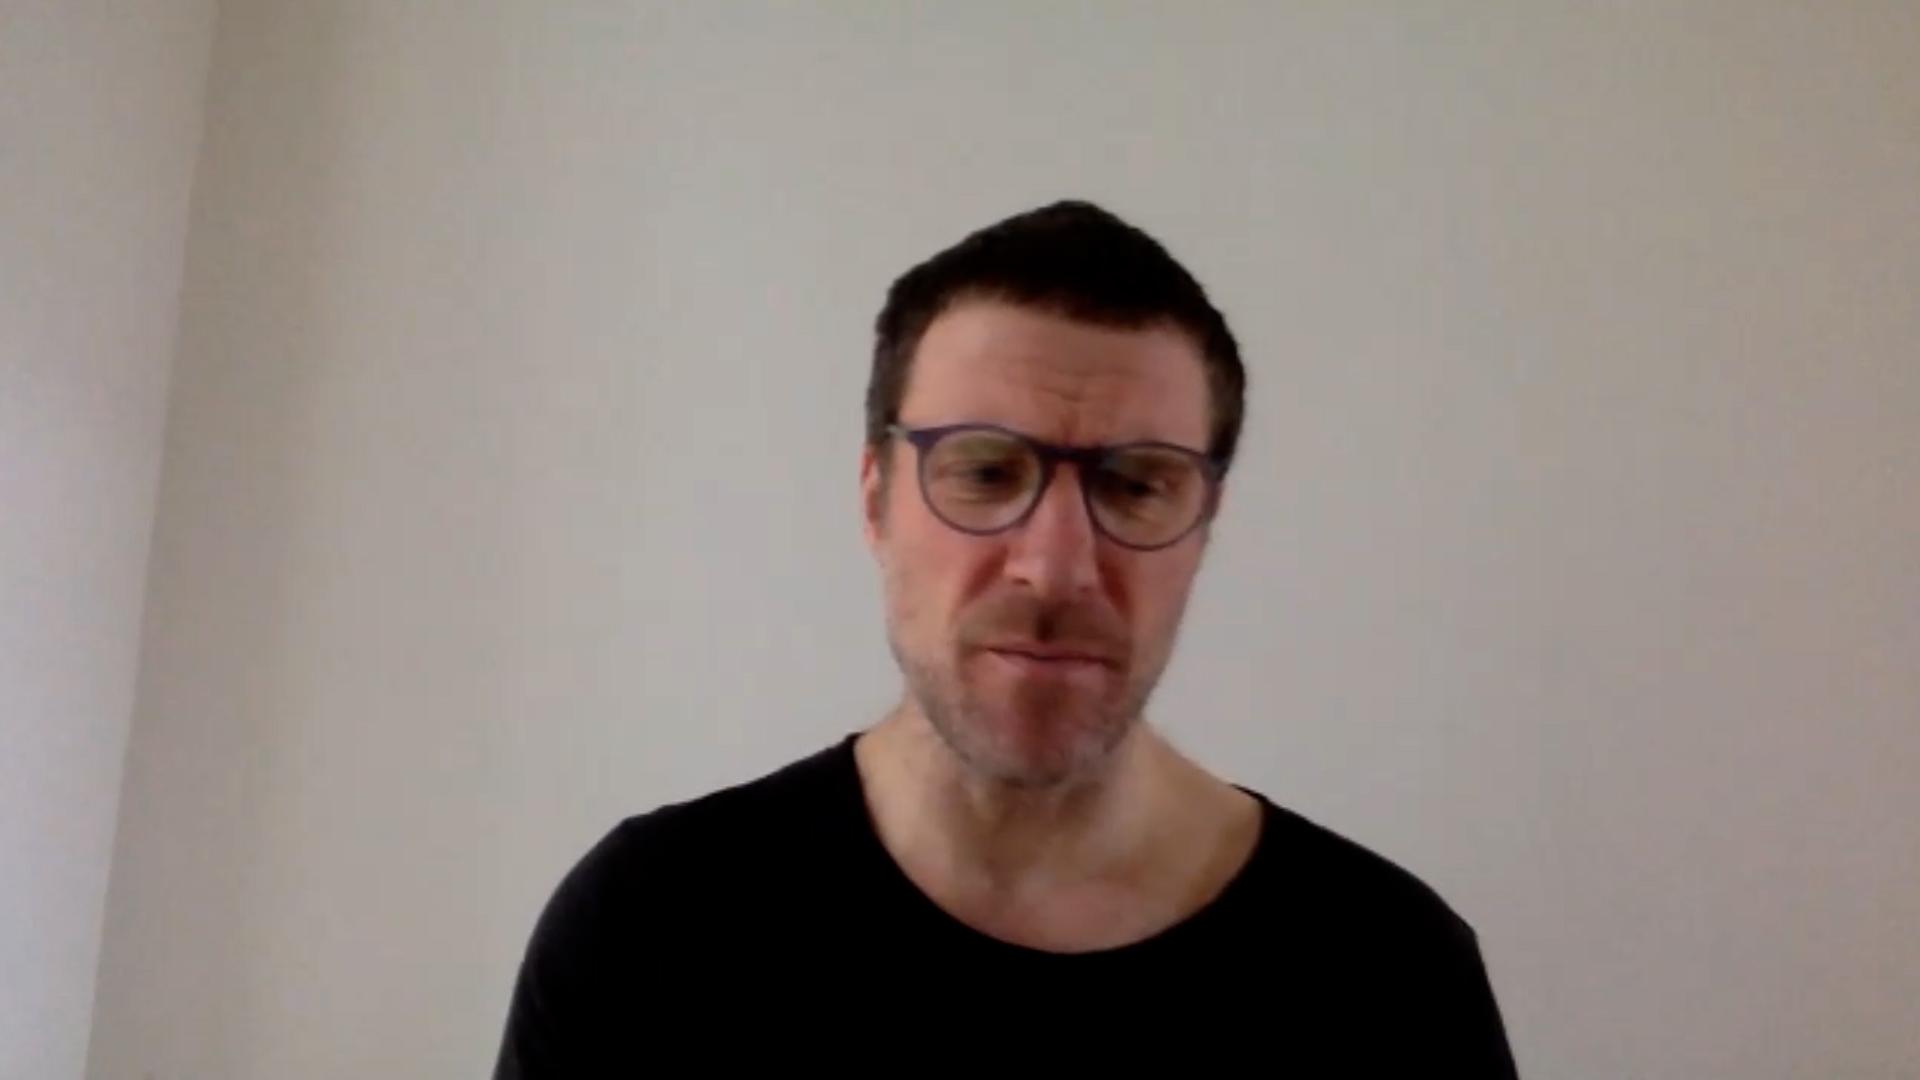 Jason Williamson from Sleaford Mods